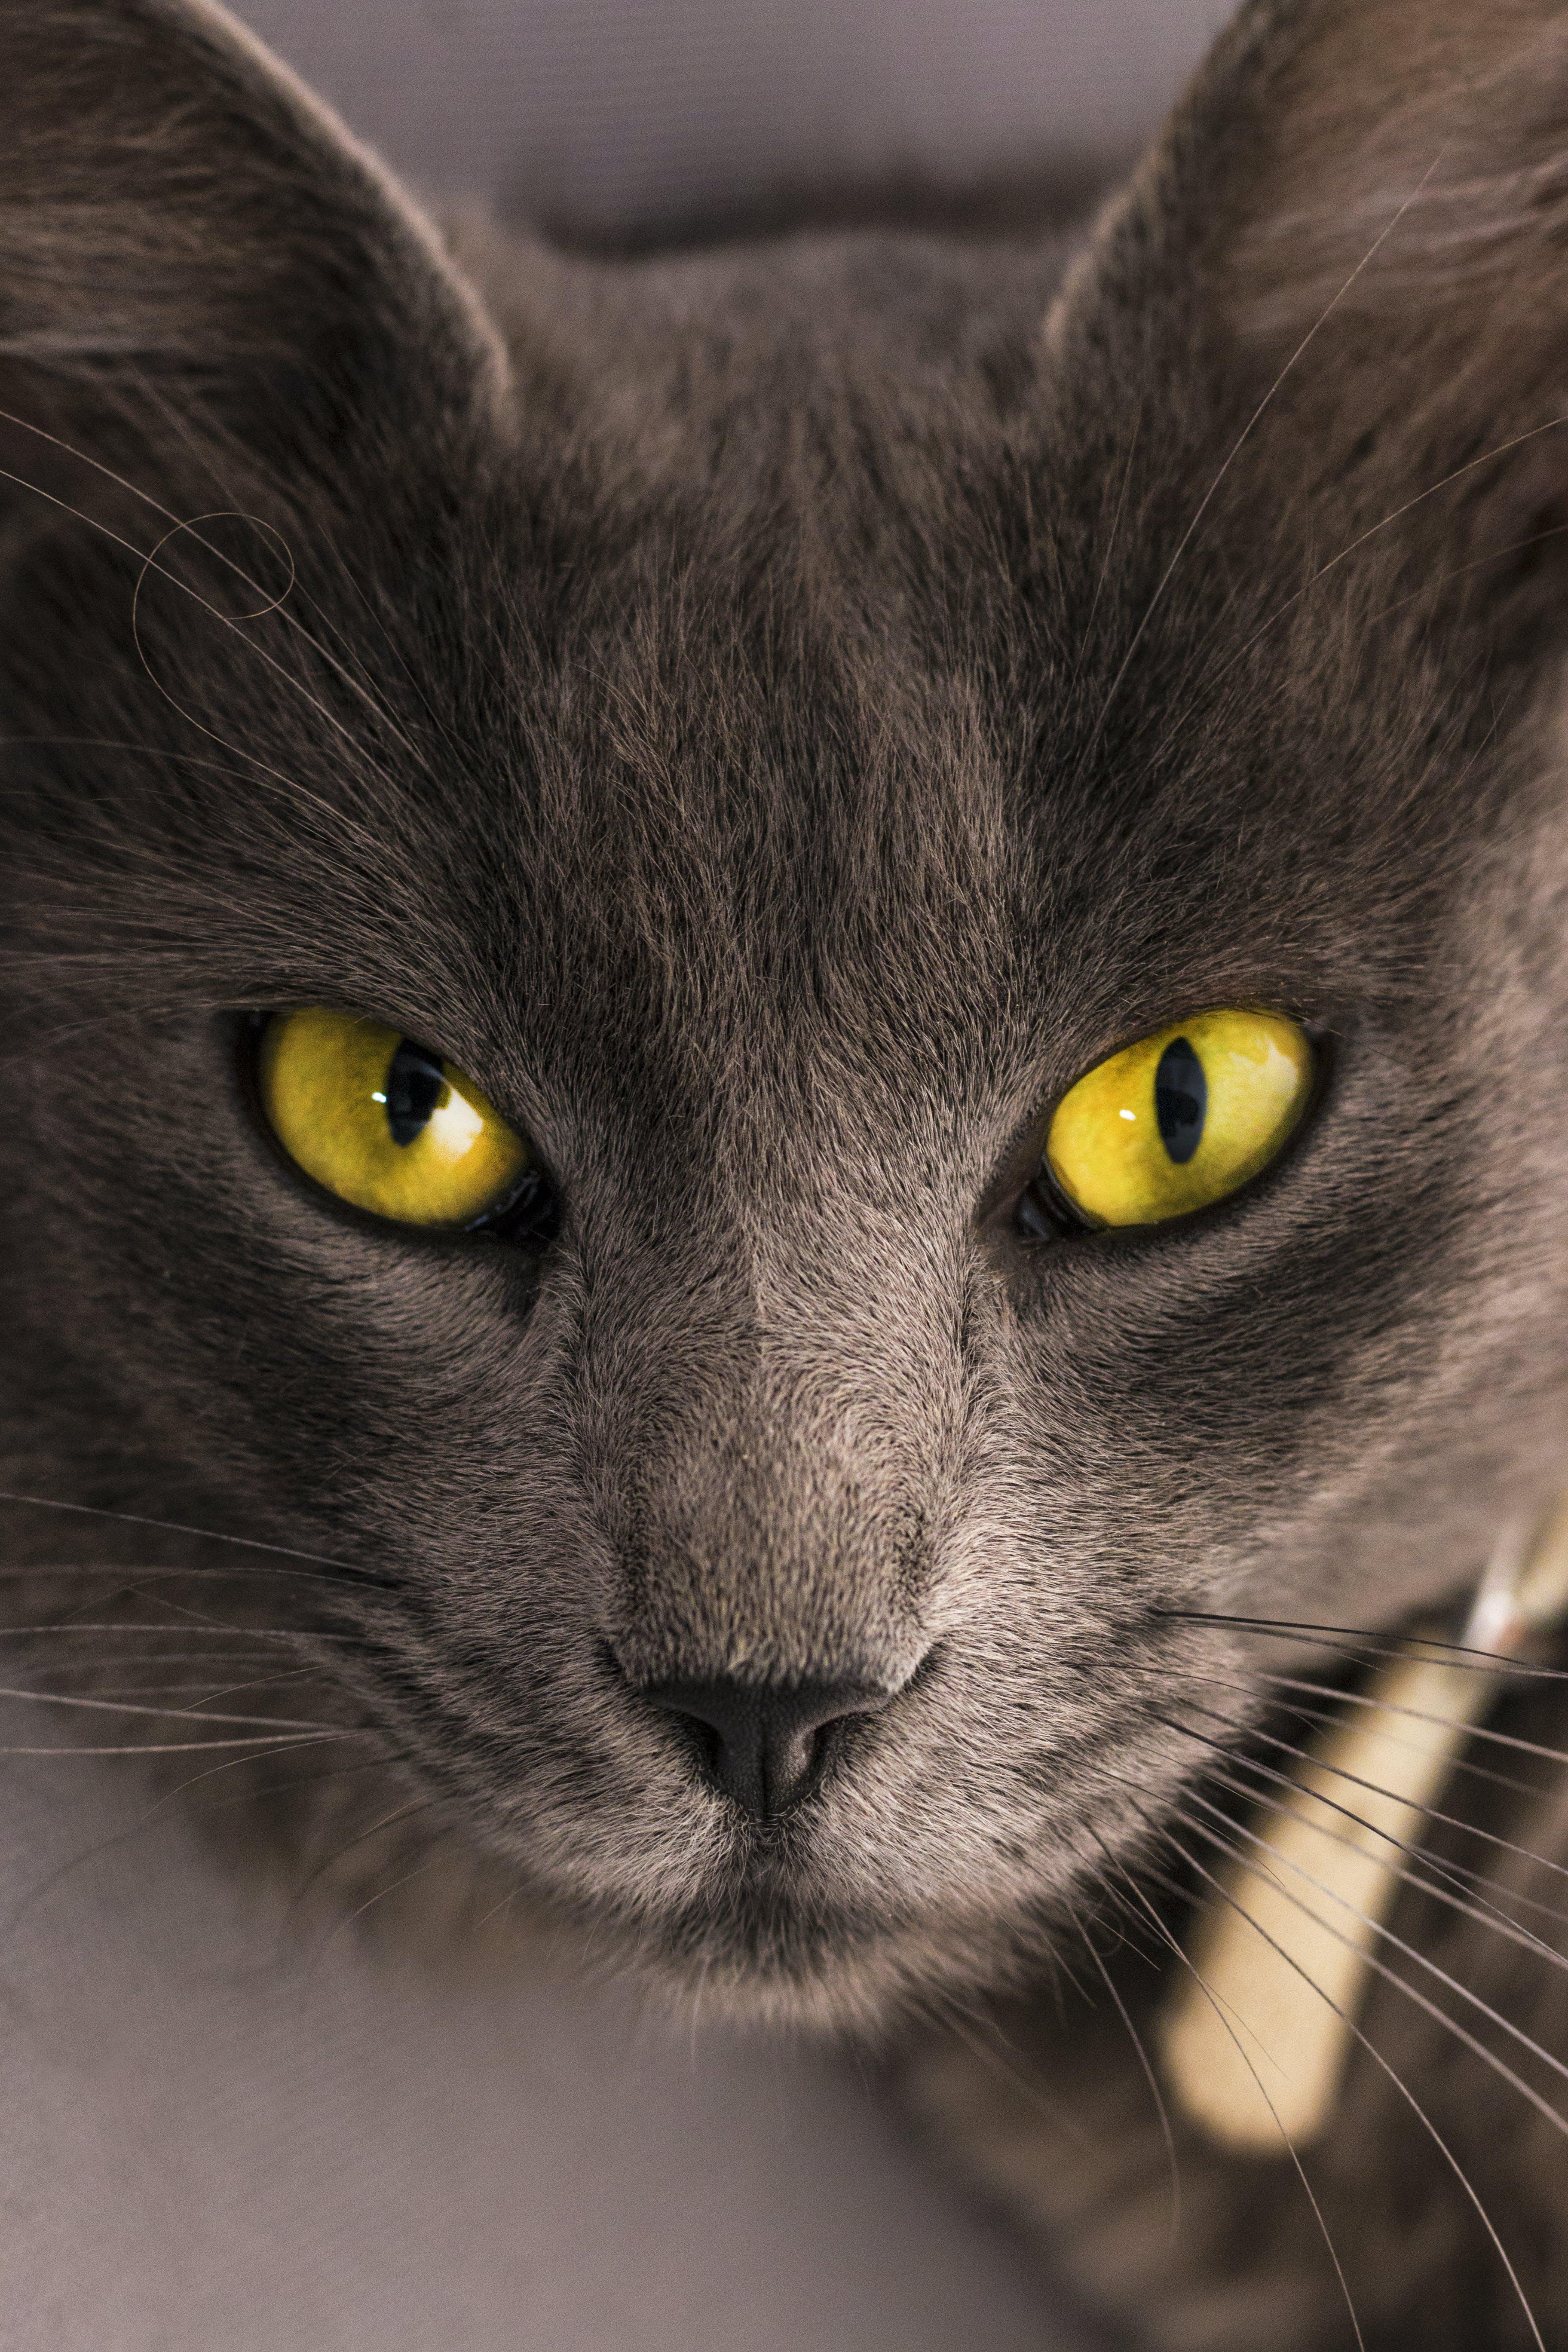 Black Cat Lying on Gray Surface